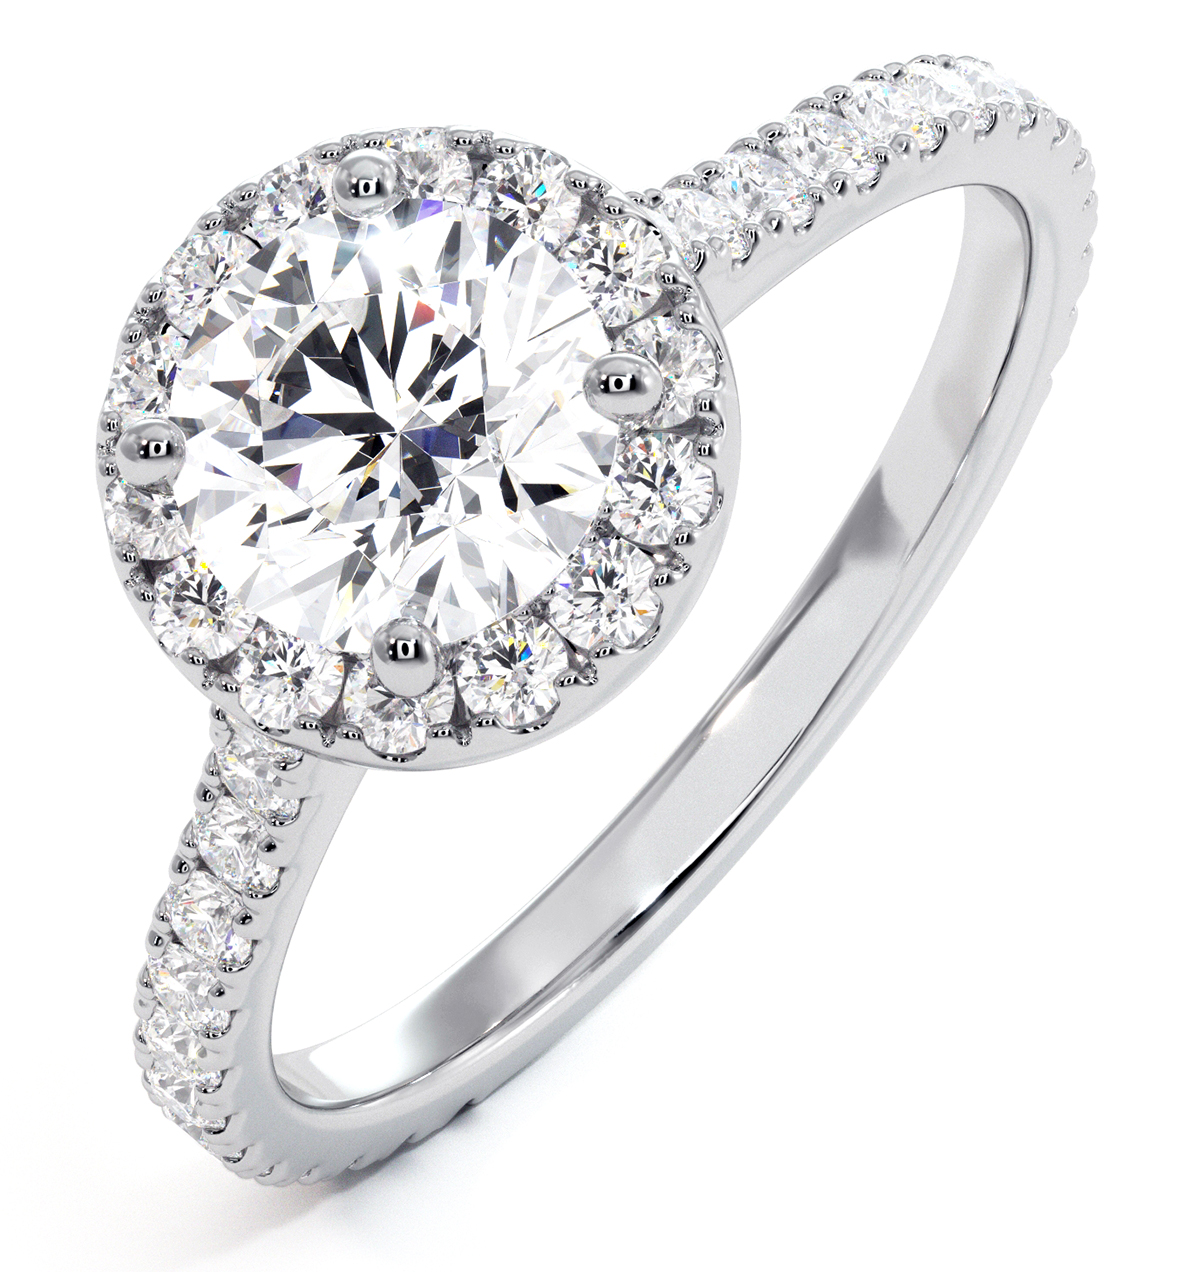 Reina GIA Diamond Halo Engagement Ring in Platinum 1.60ct G/VS1 - image 1